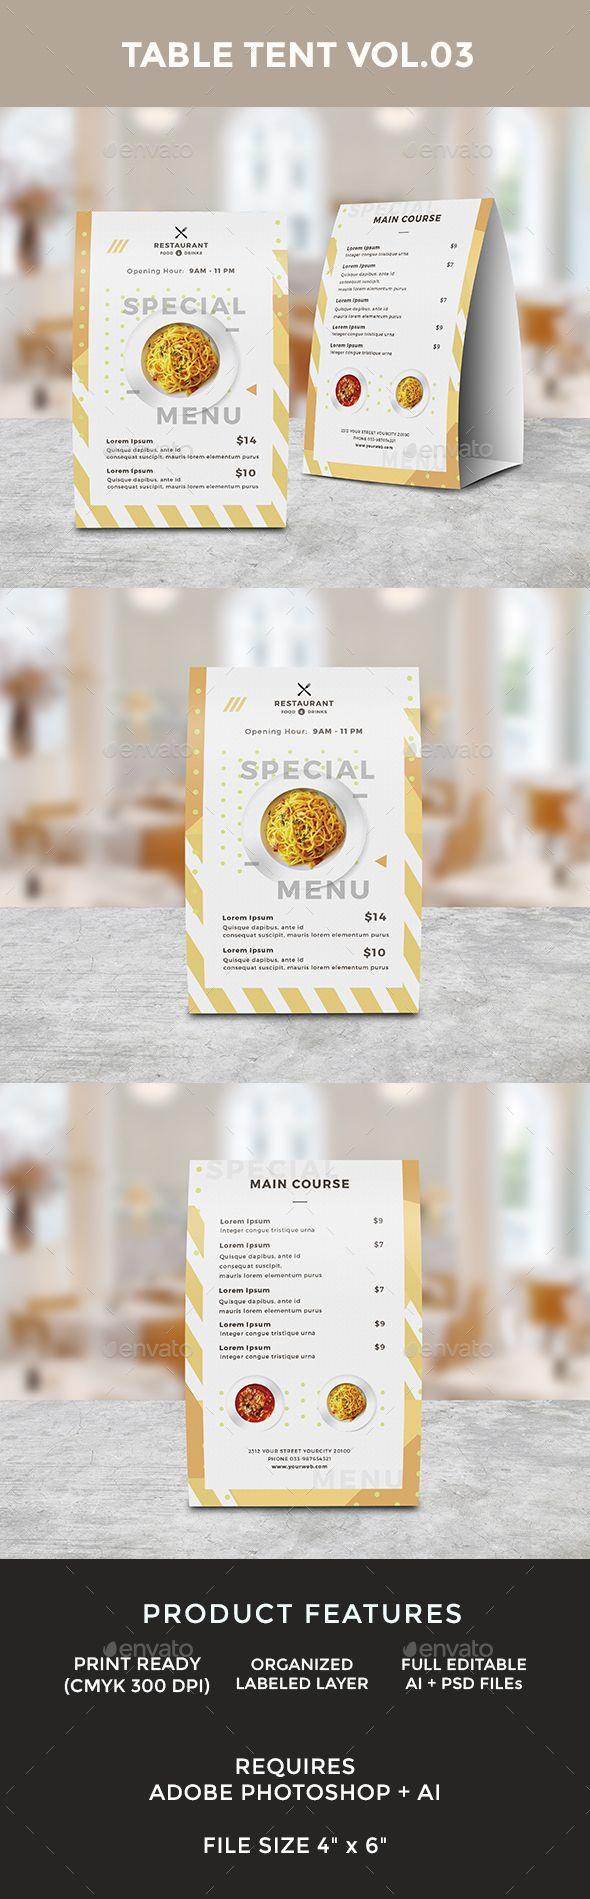 Food Menu Table Tent Template PSD, AI Illustrator